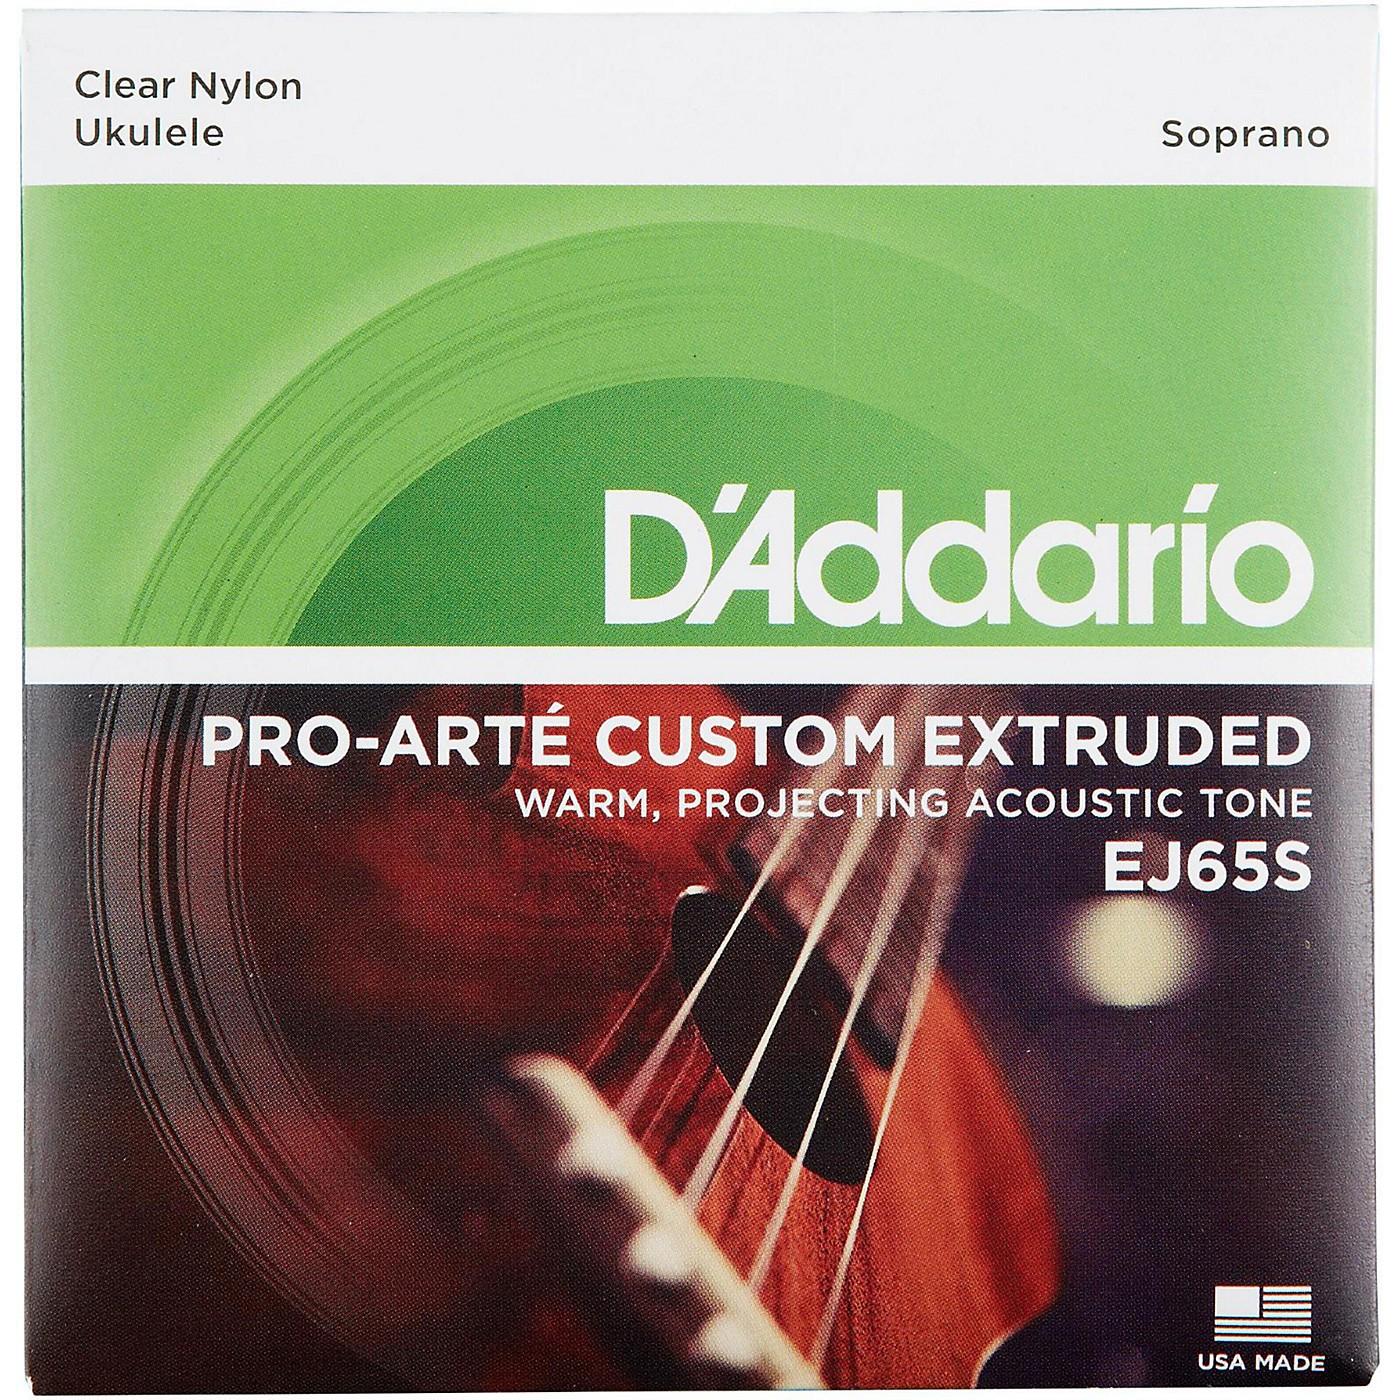 D'Addario EJ65S Pro-Arte Custom Extruded Soprano Nylon Ukulele Strings thumbnail